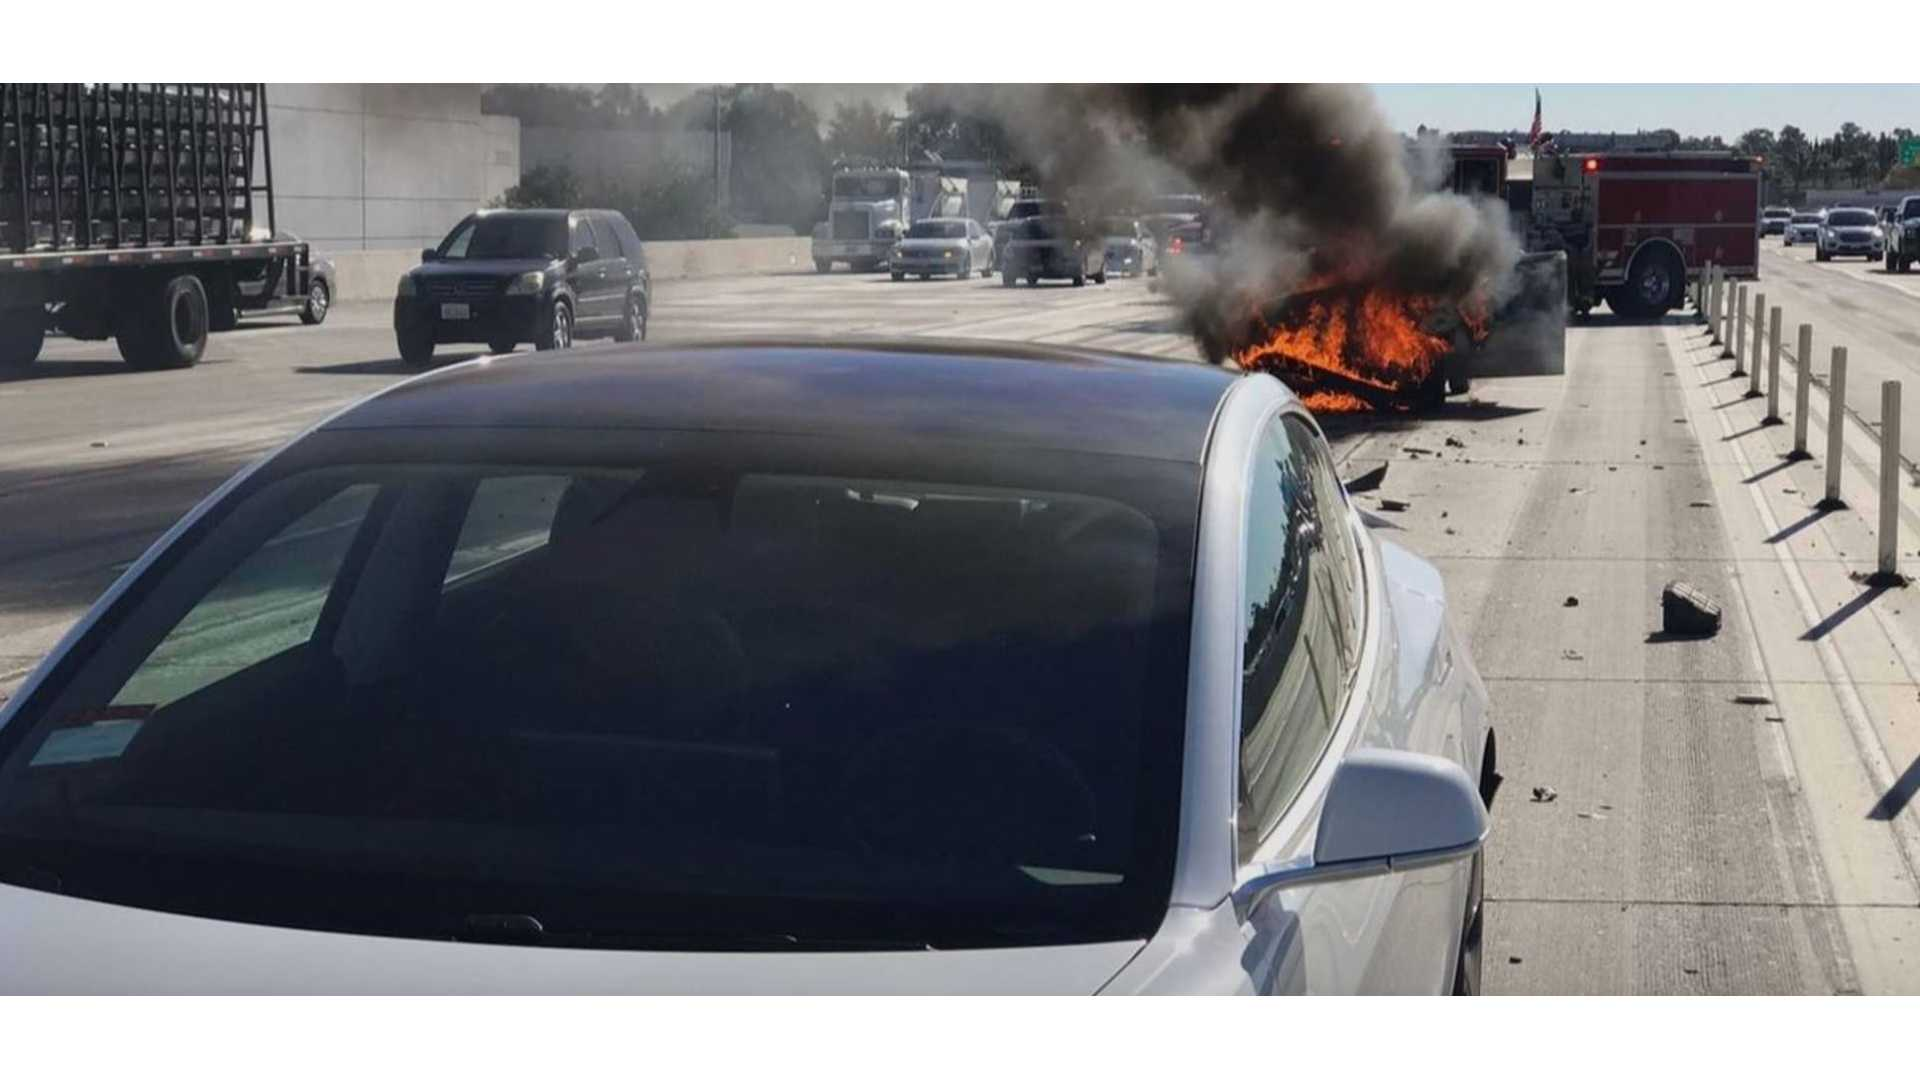 The Media Seems To Have It Backwards Regarding Tesla Fires